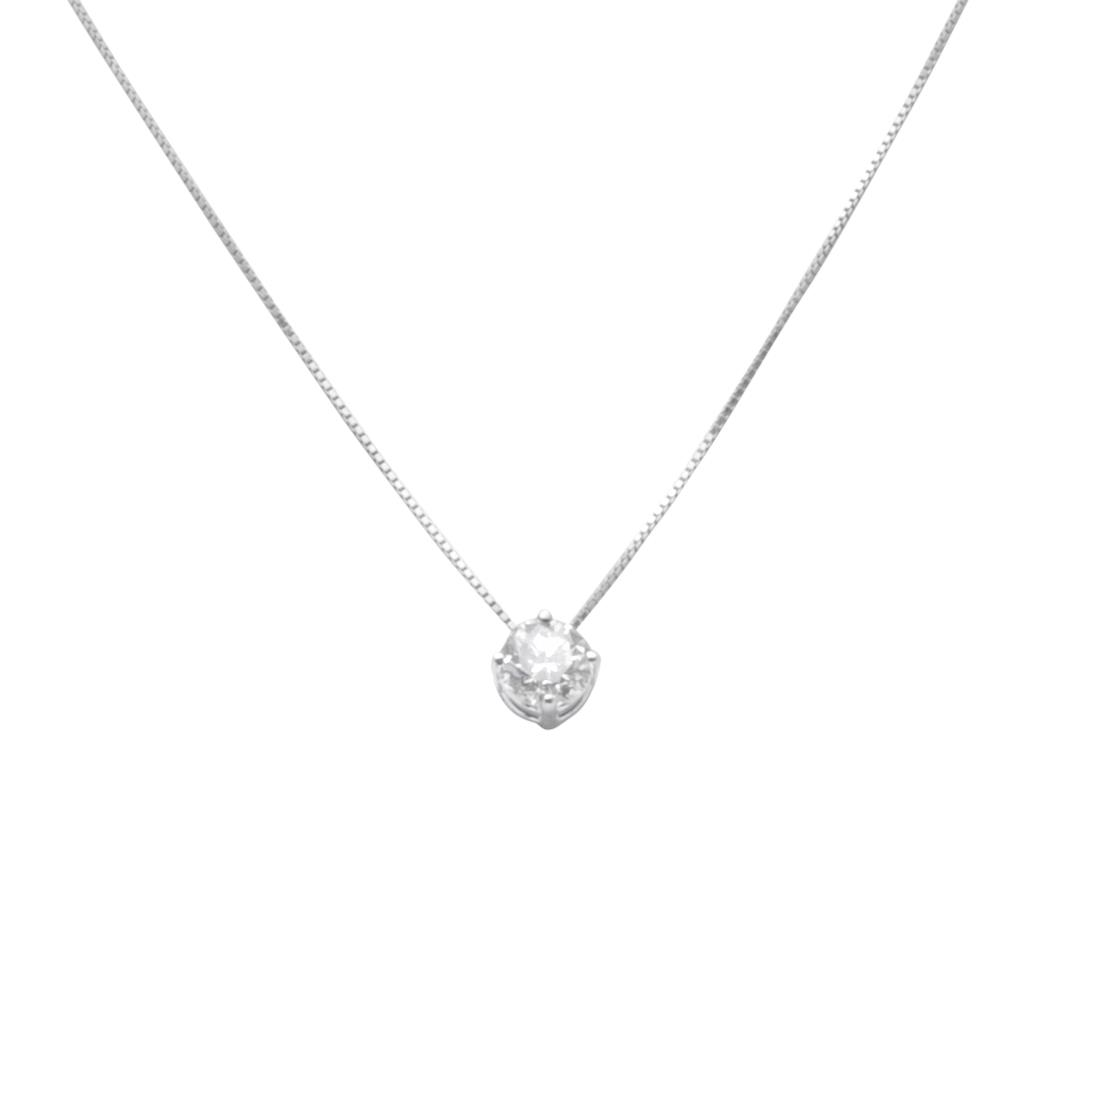 White gold light point necklace with 0.60 ct diamond - ALFIERI & ST. JOHN